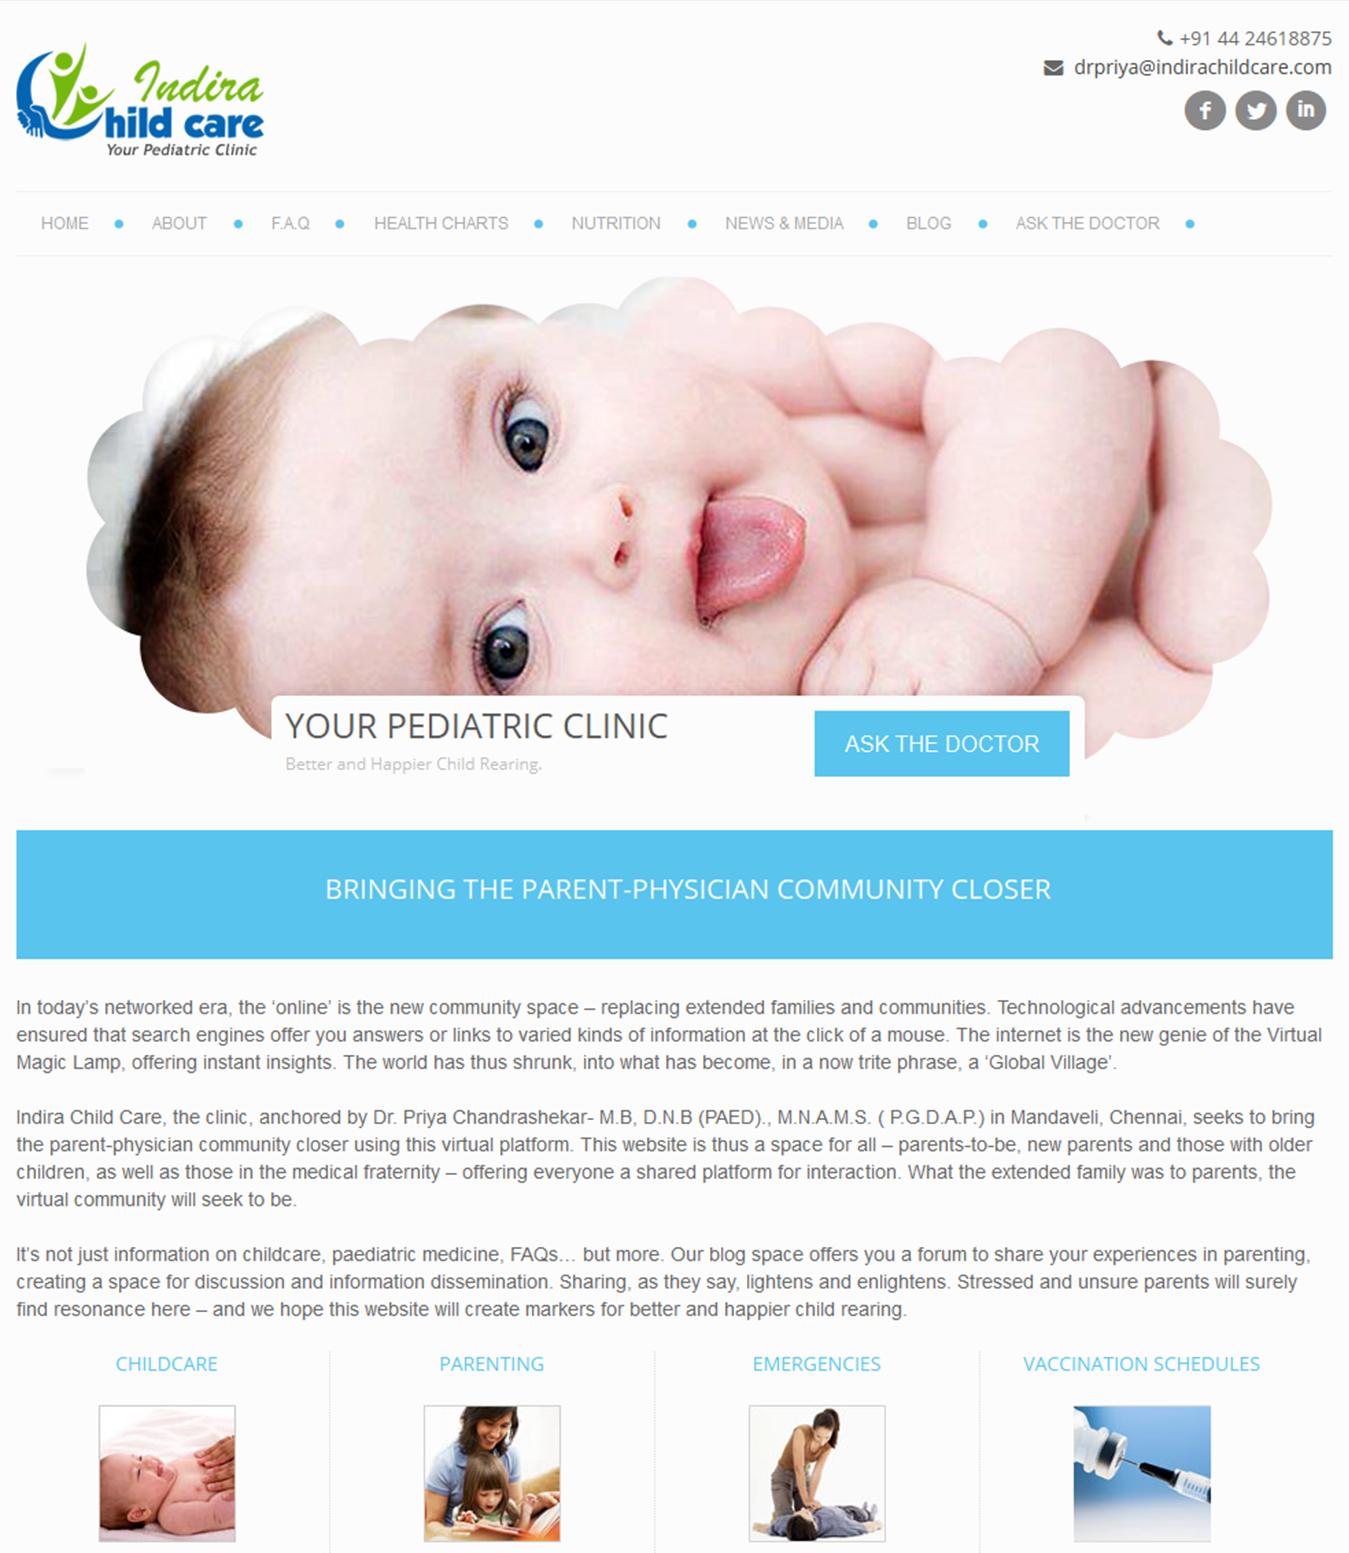 Indira Child Care